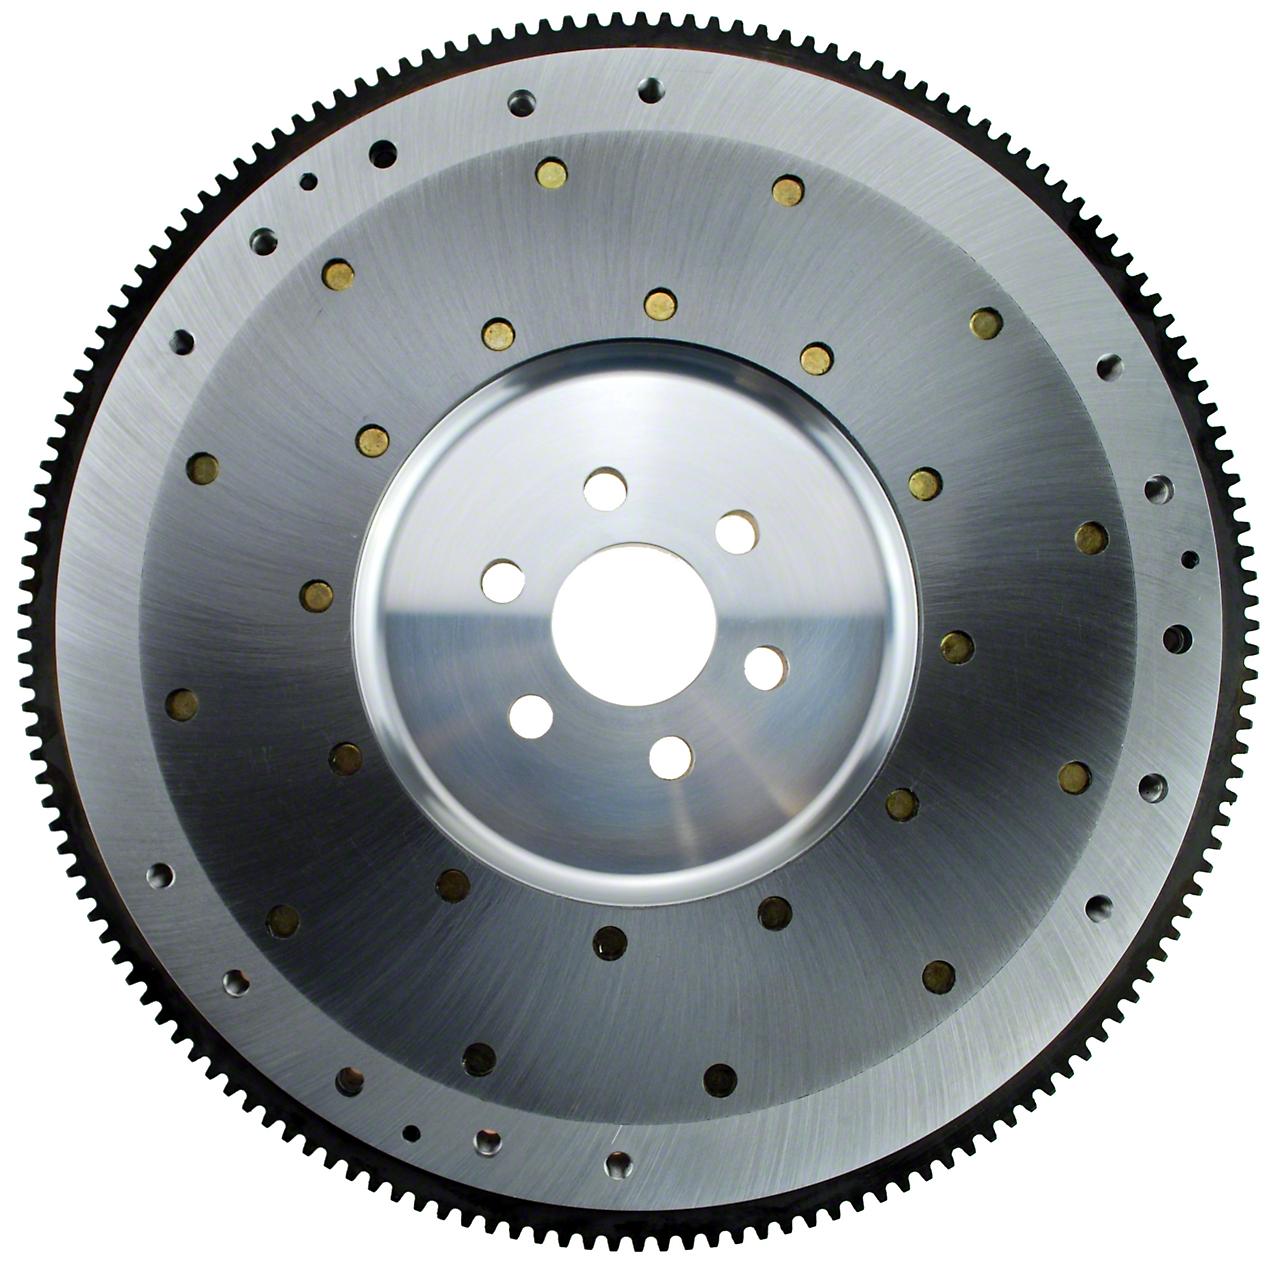 RAM Billet Aluminum Flywheel - 6 Bolt 50 oz (86-95 5.0L, 93-95 Cobra)